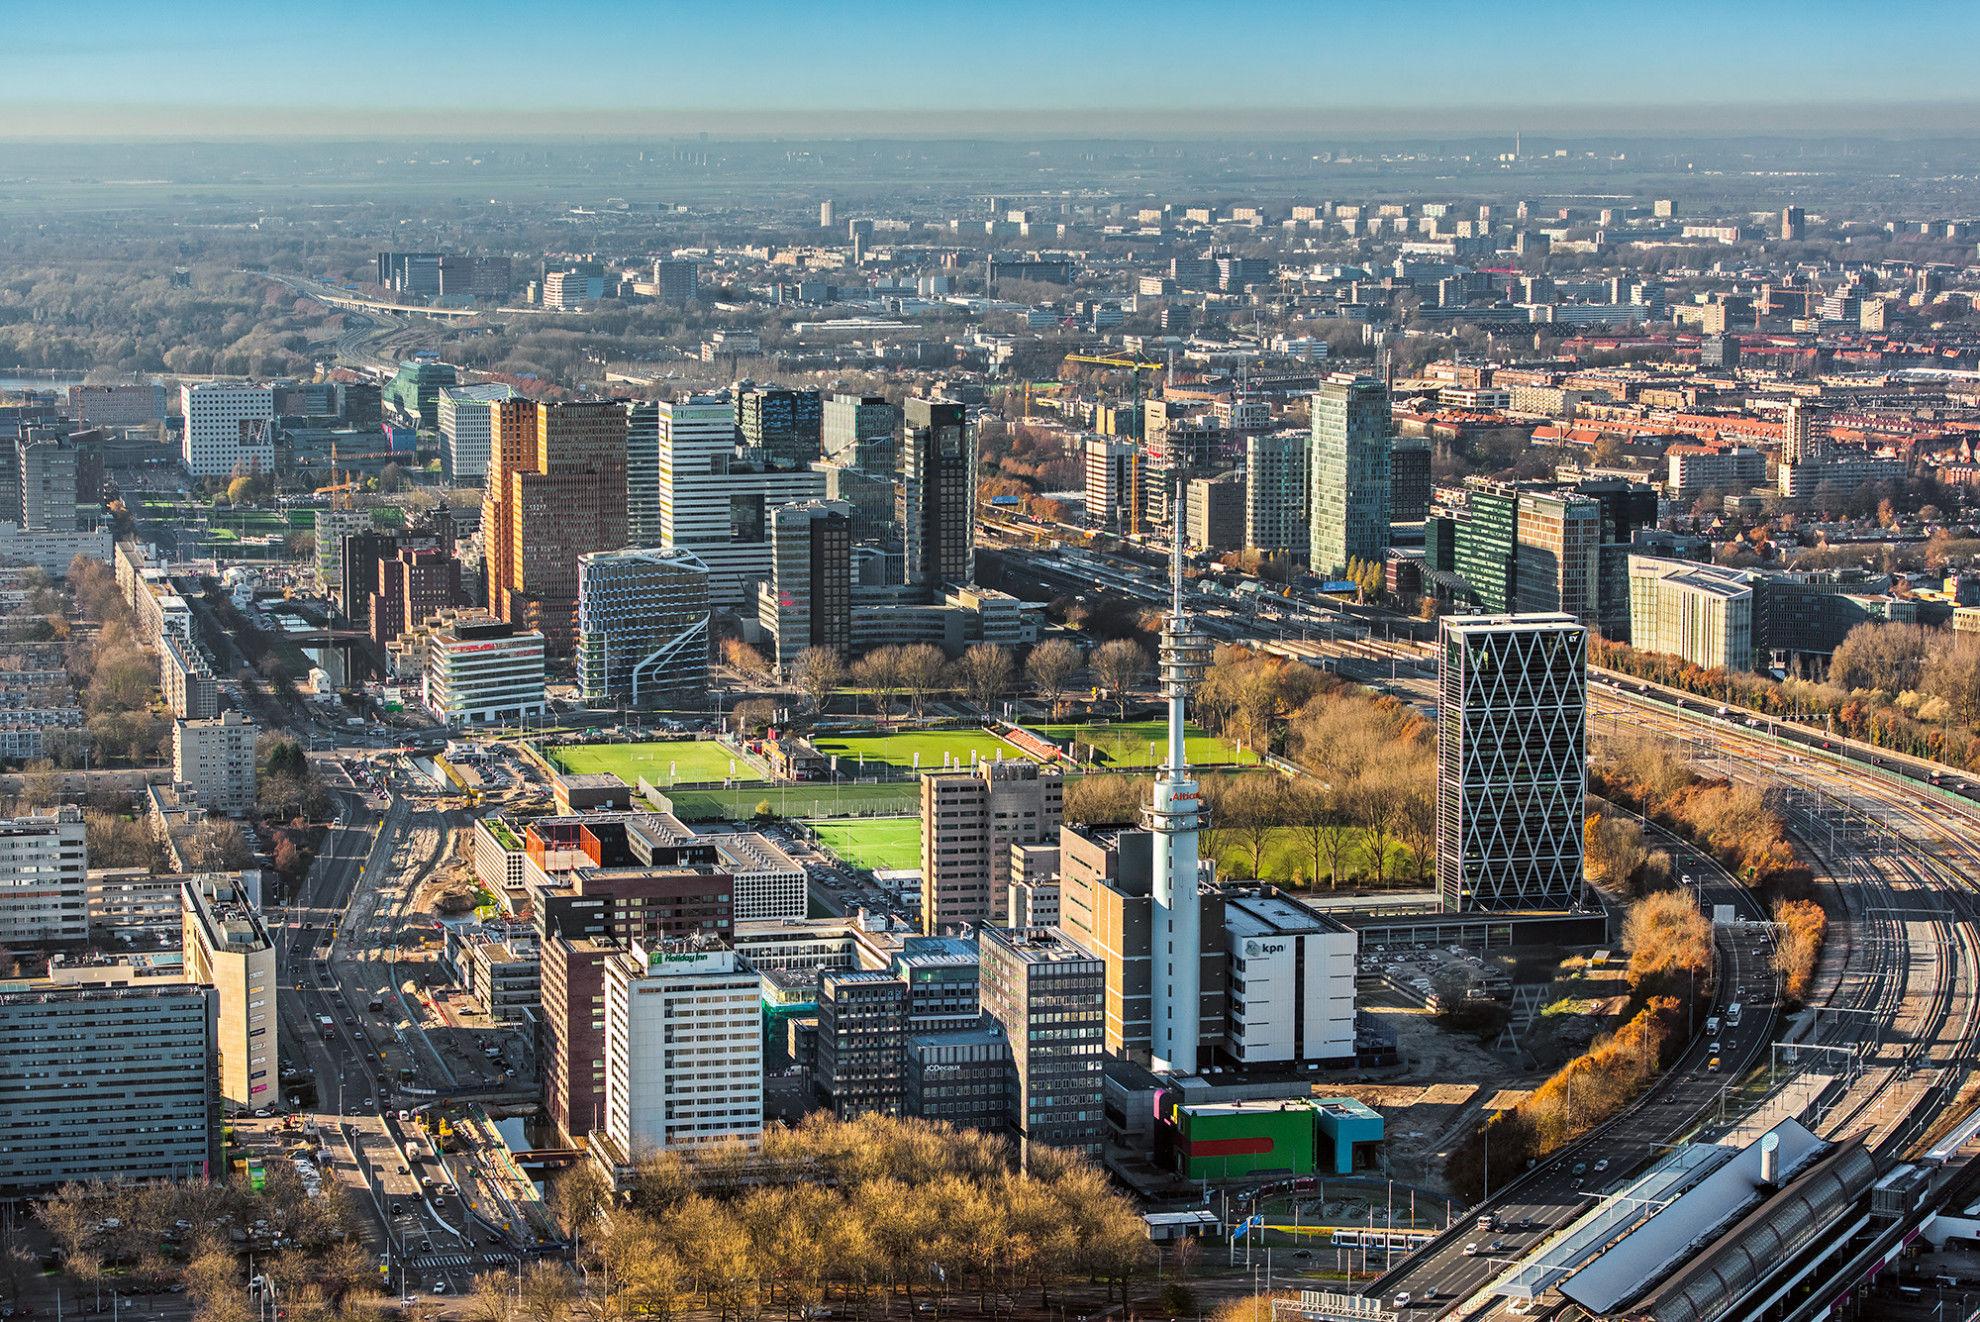 2017-overizcht-zuidas-luchtfoto-at-flying-holland